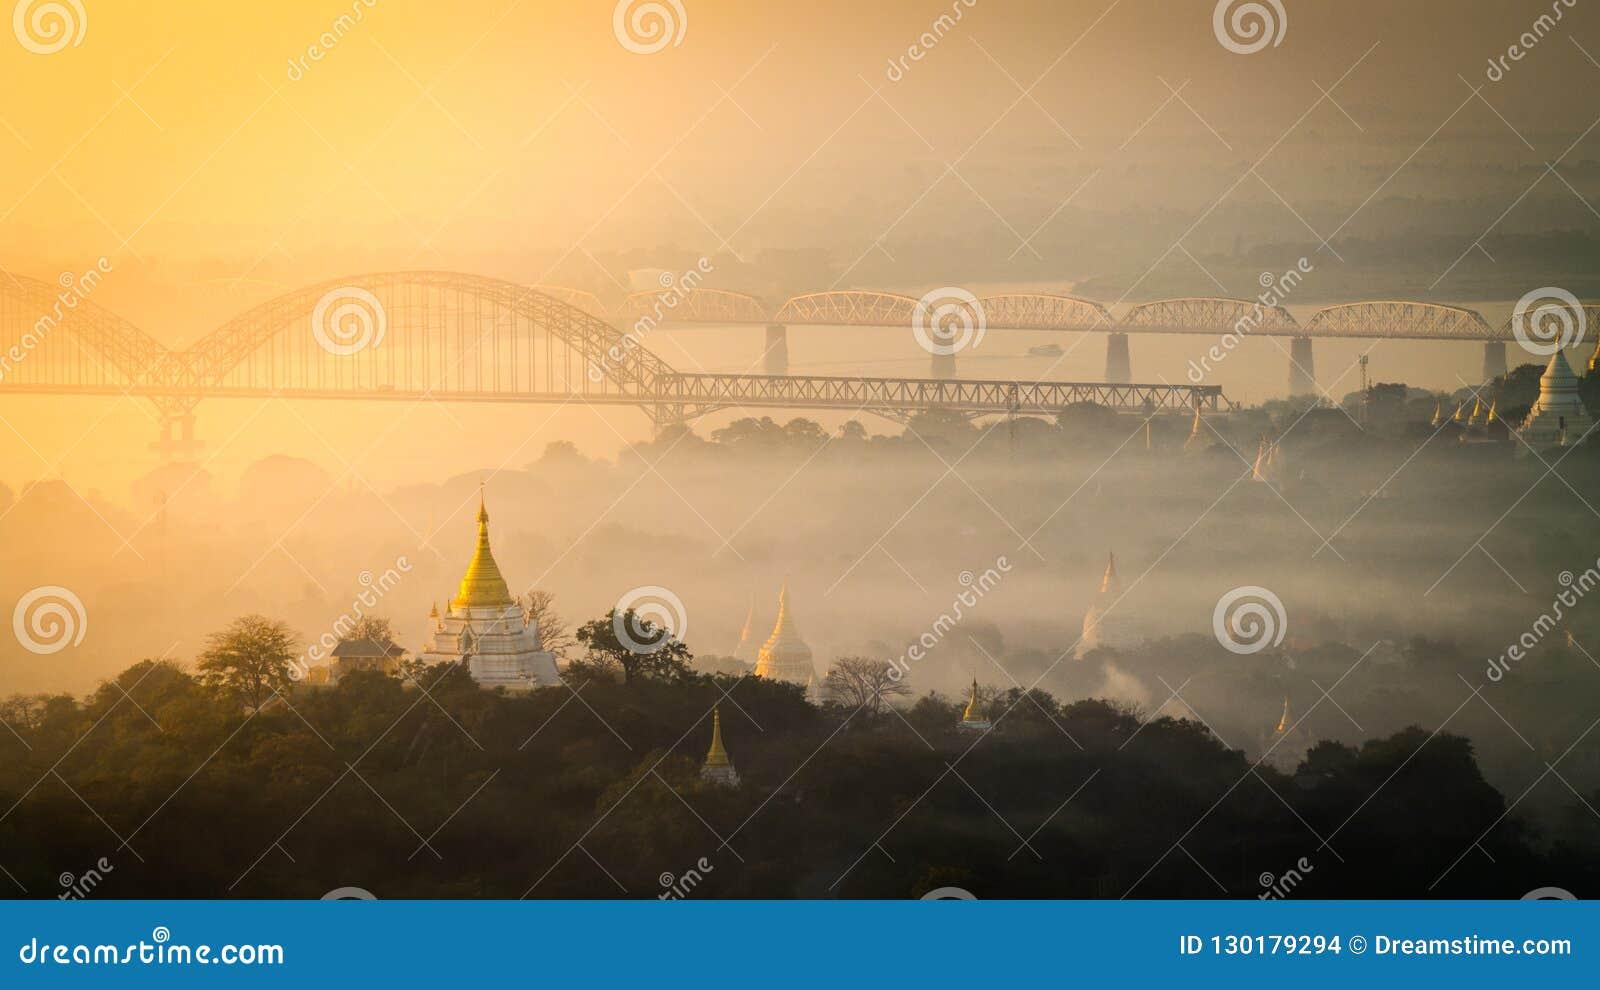 Temple scene at sunrise